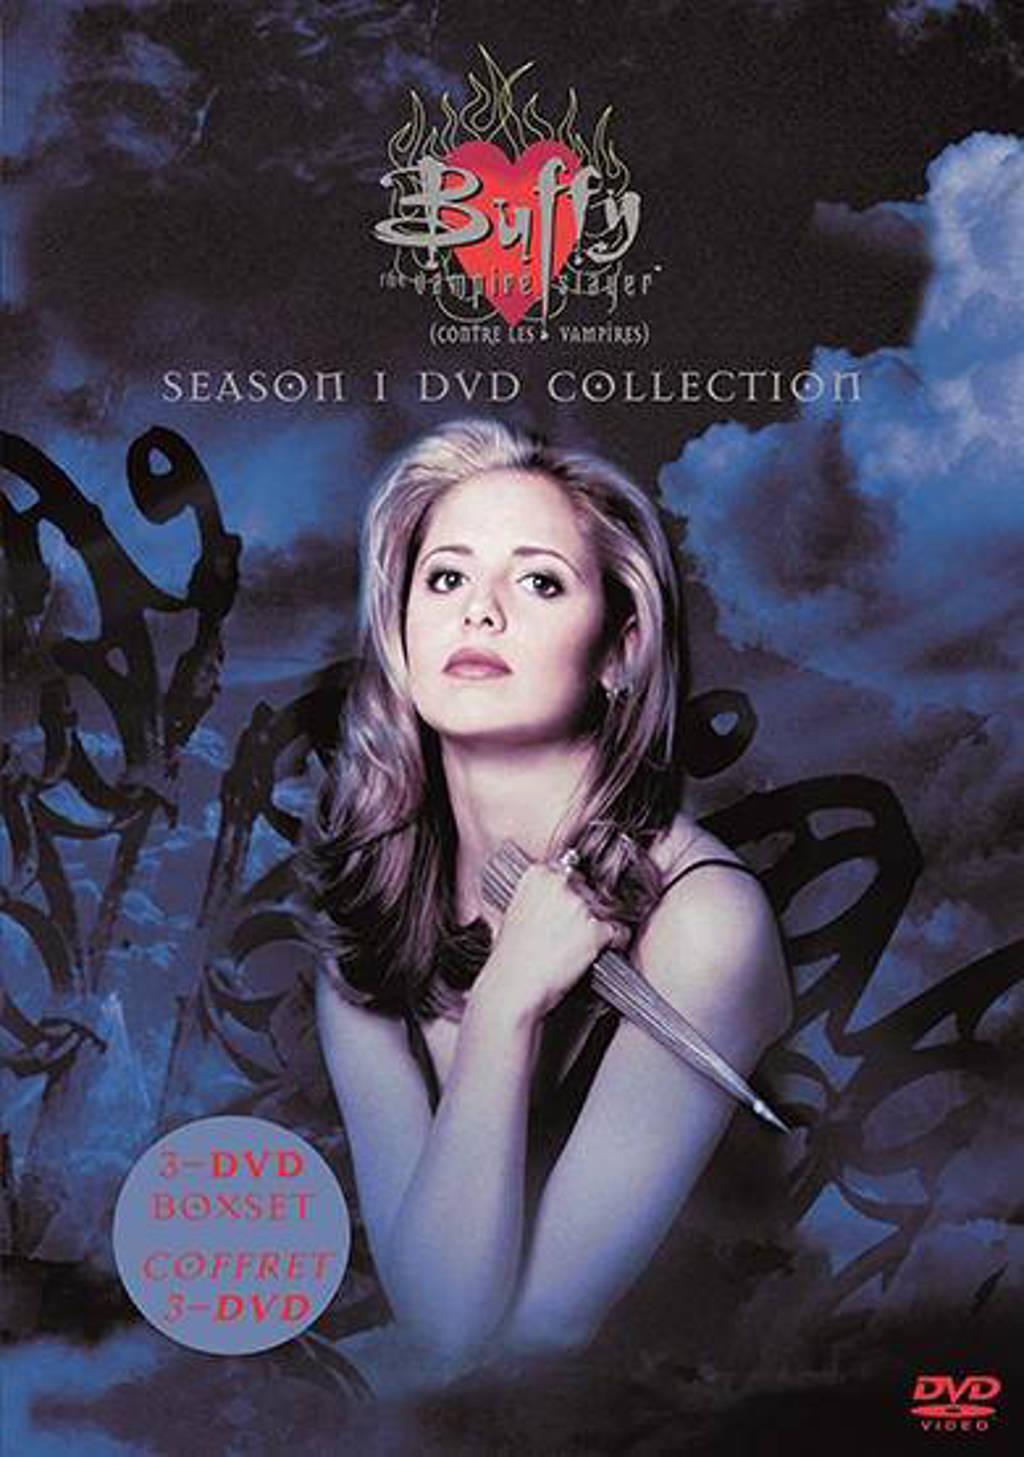 Buffy the vampire slayer - Seizoen 1 (DVD)